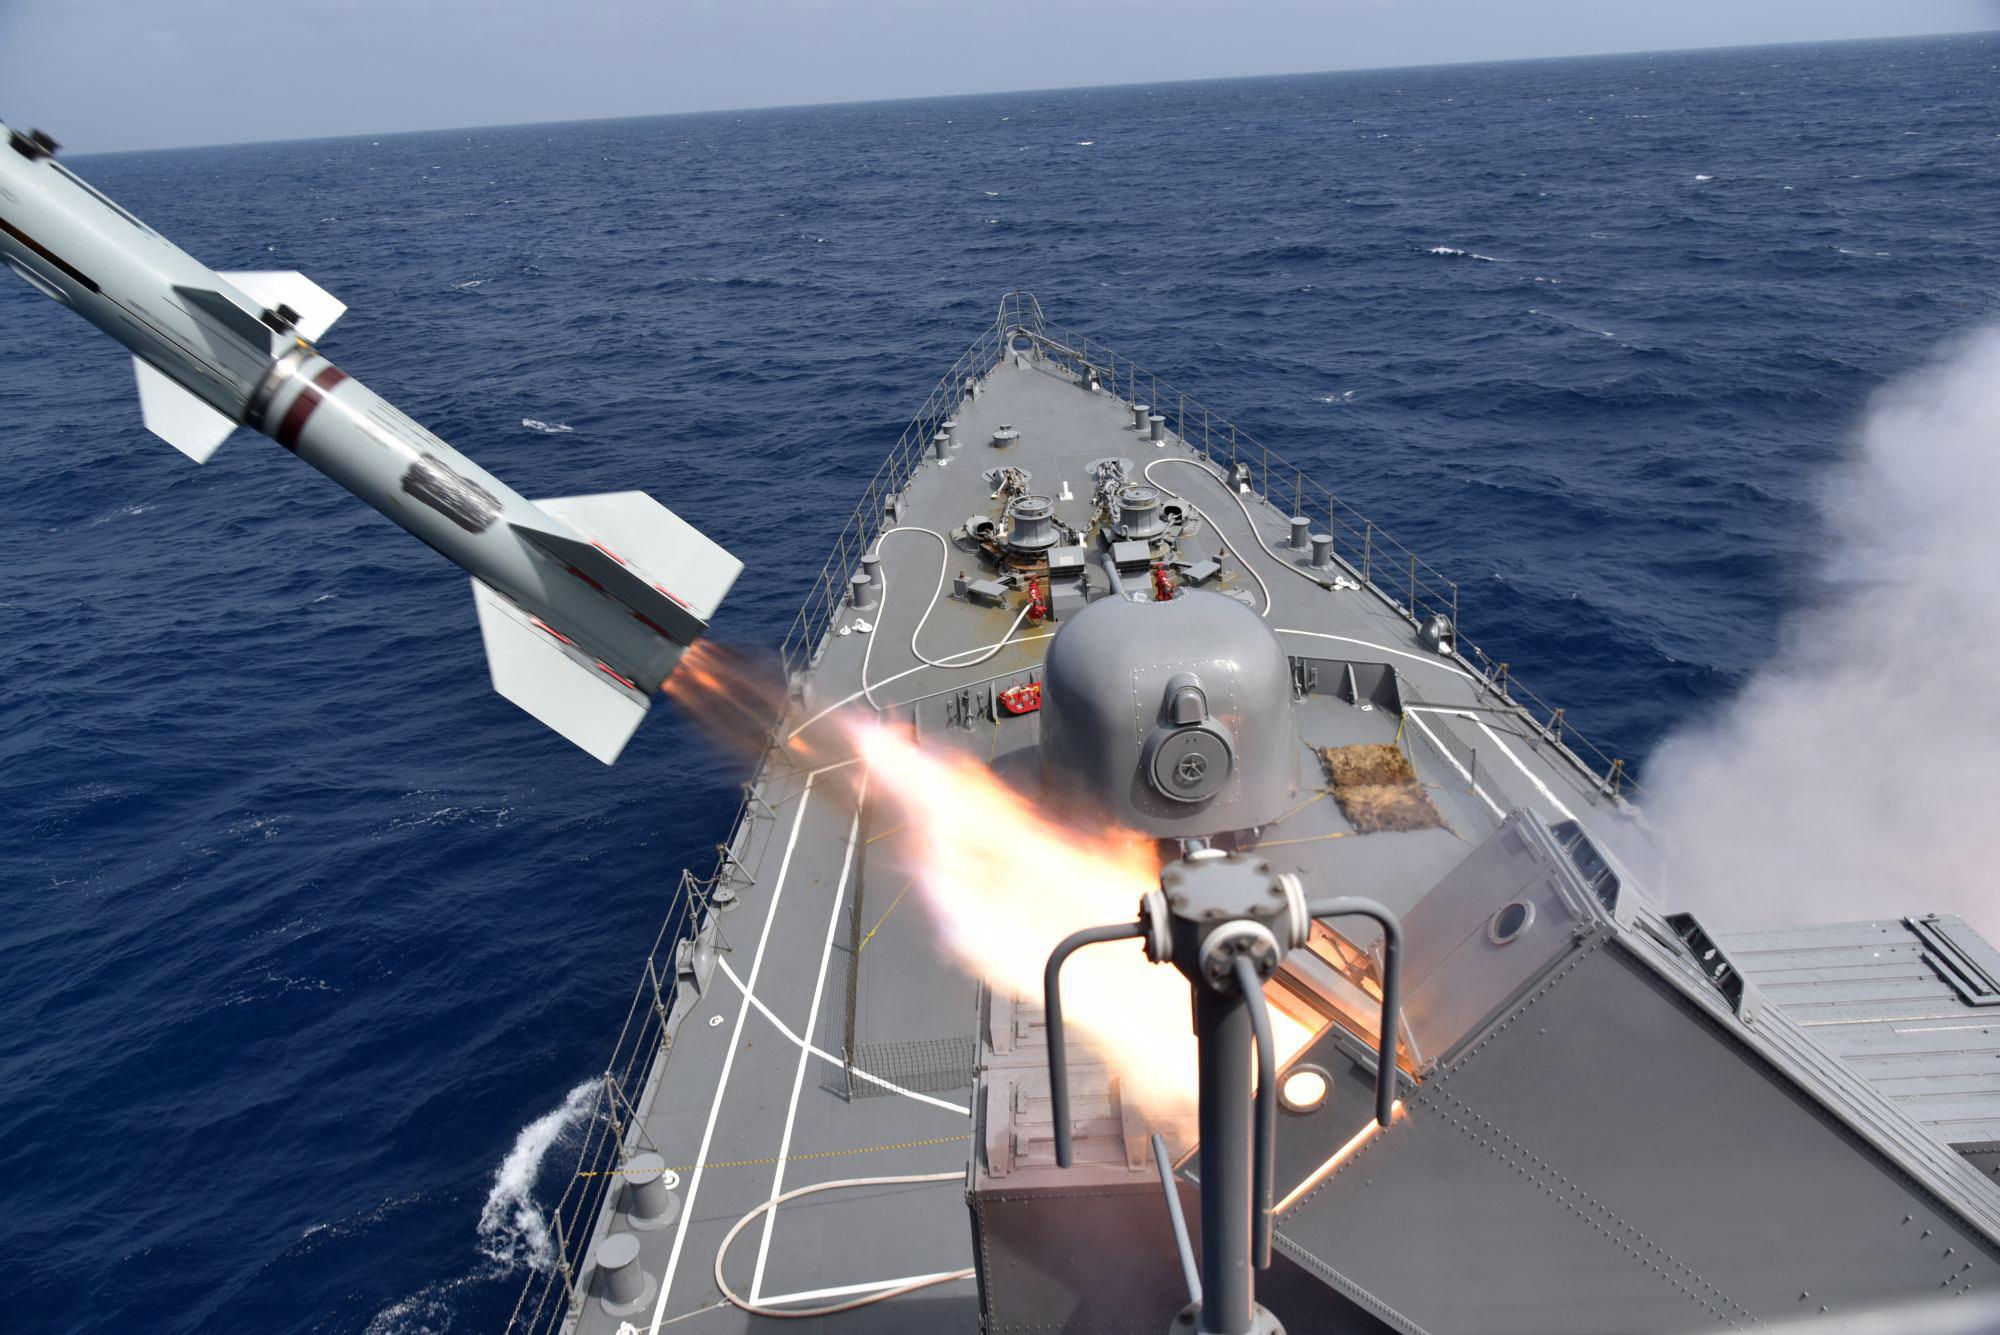 Japan Maritime Self-Defense Force JS SHIMAYUKI (TV 3513) RUR-5 ASROC anti-submarine rocket system